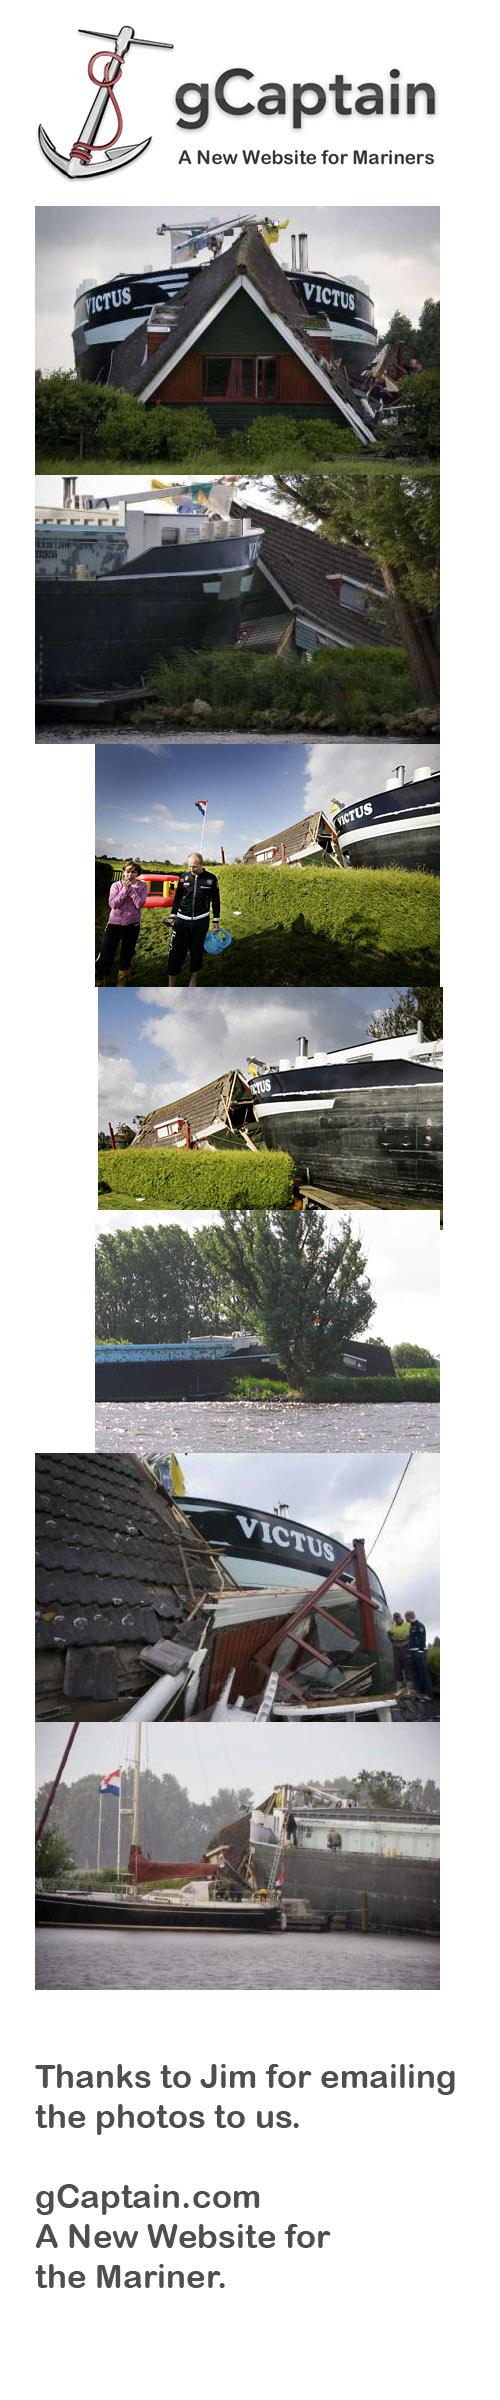 Ship Runs Into House - Maritime Incident